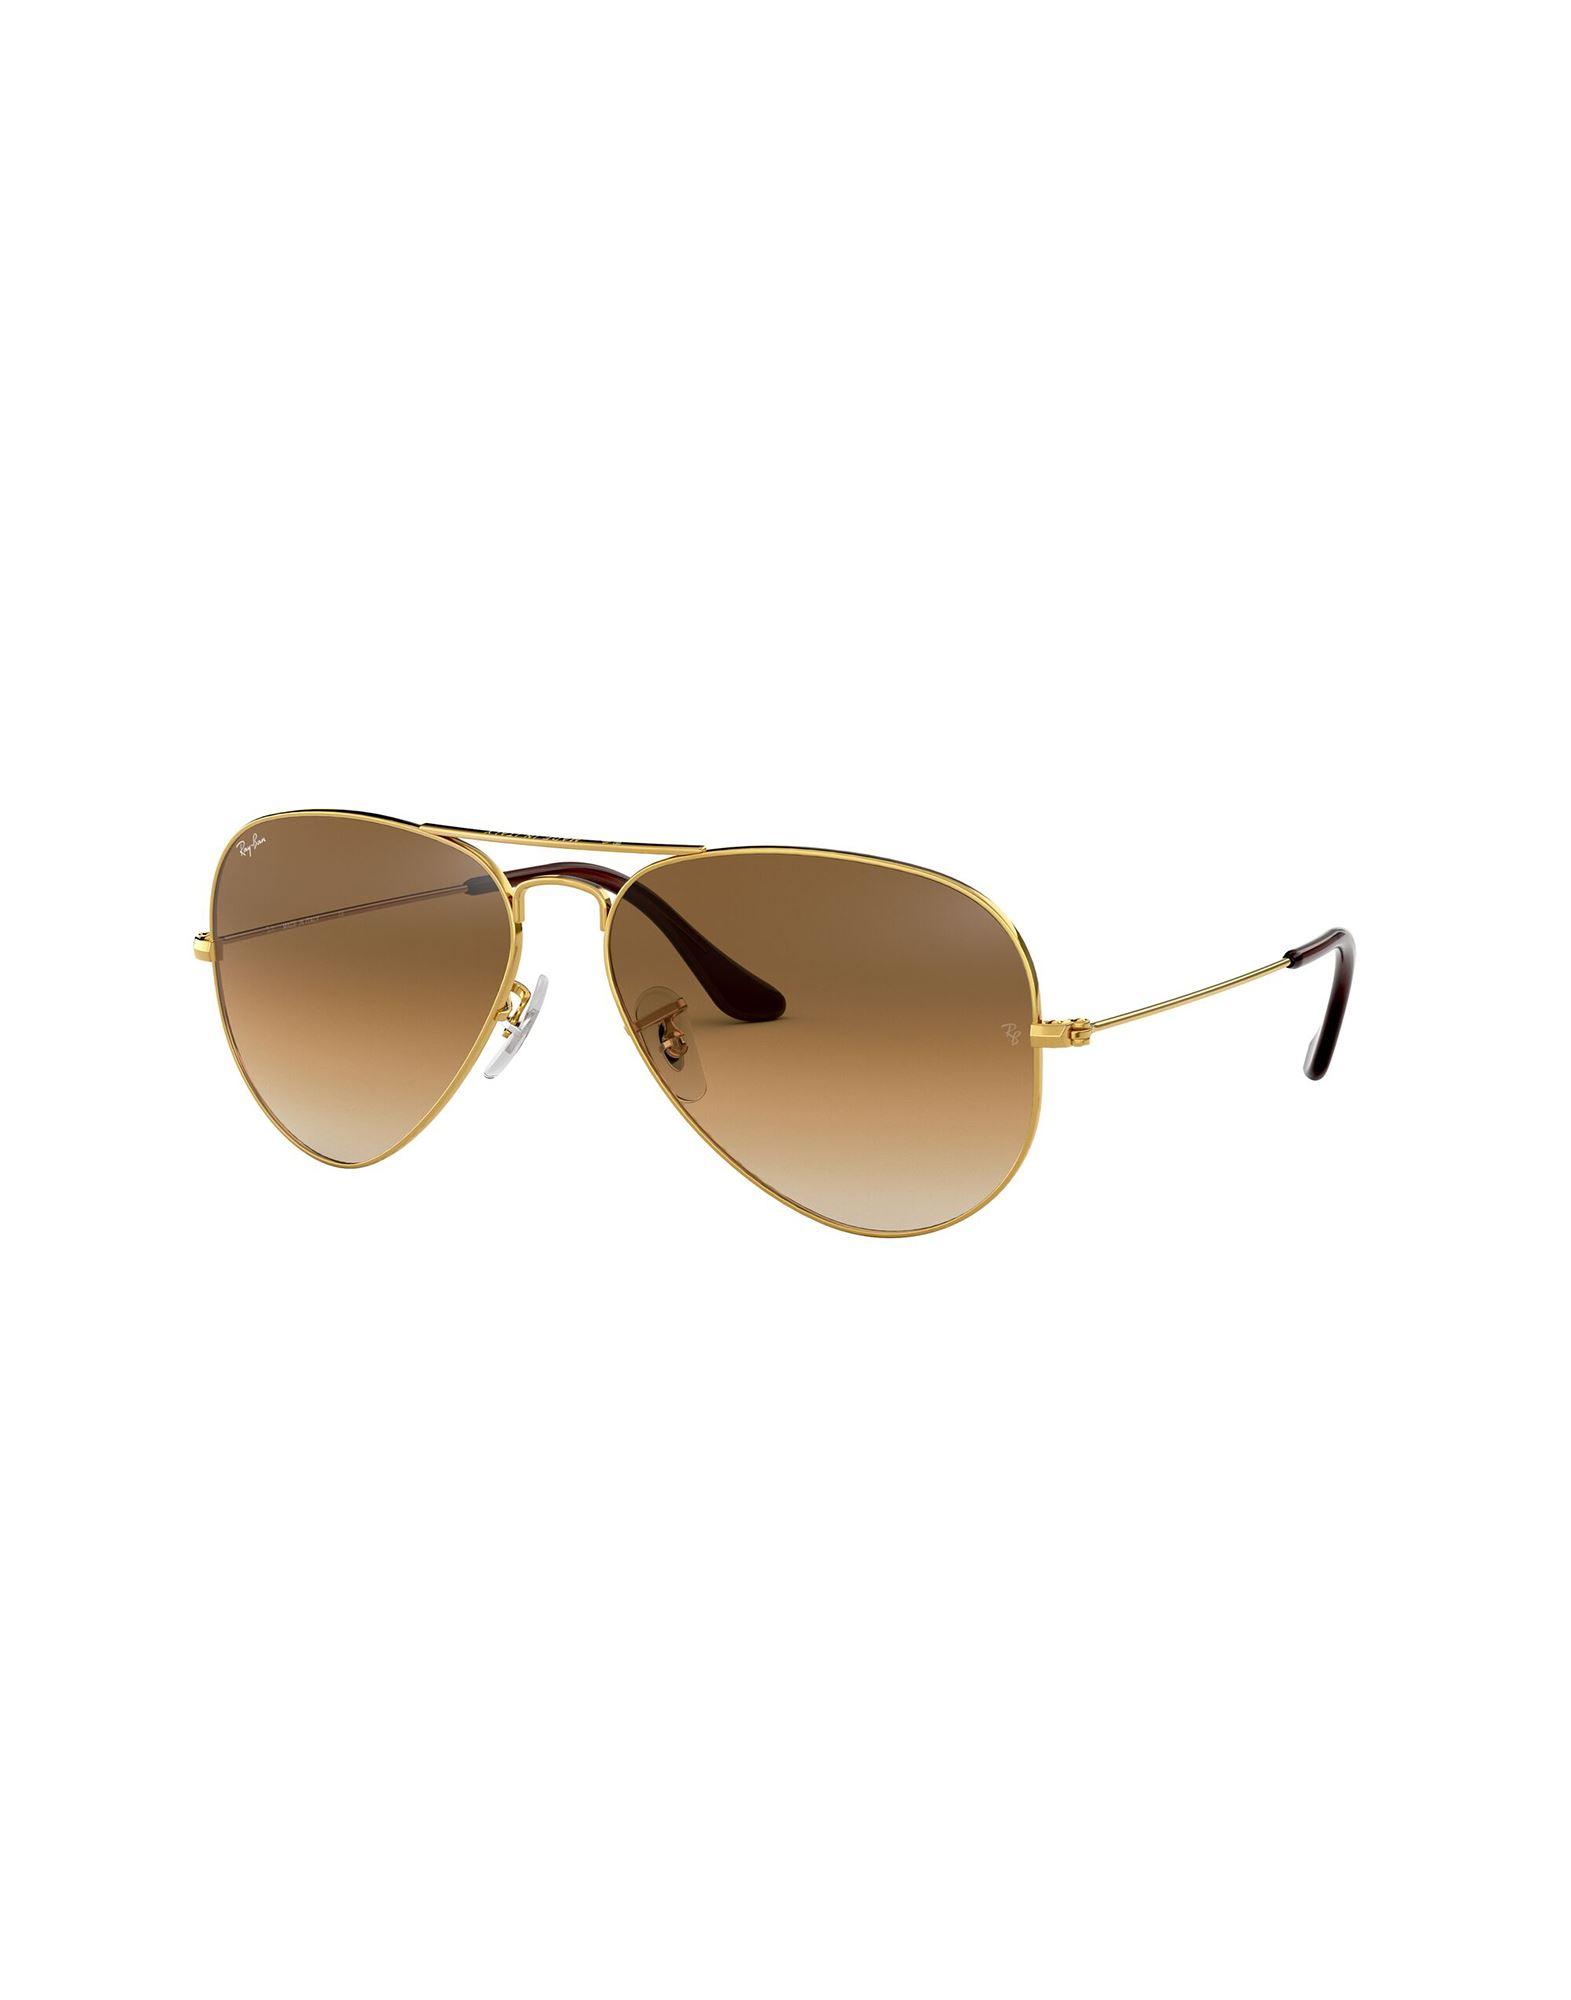 Occhiali Da Sole Ray-Ban Rb3025 Original Aviator - Uomo - Acquista online su